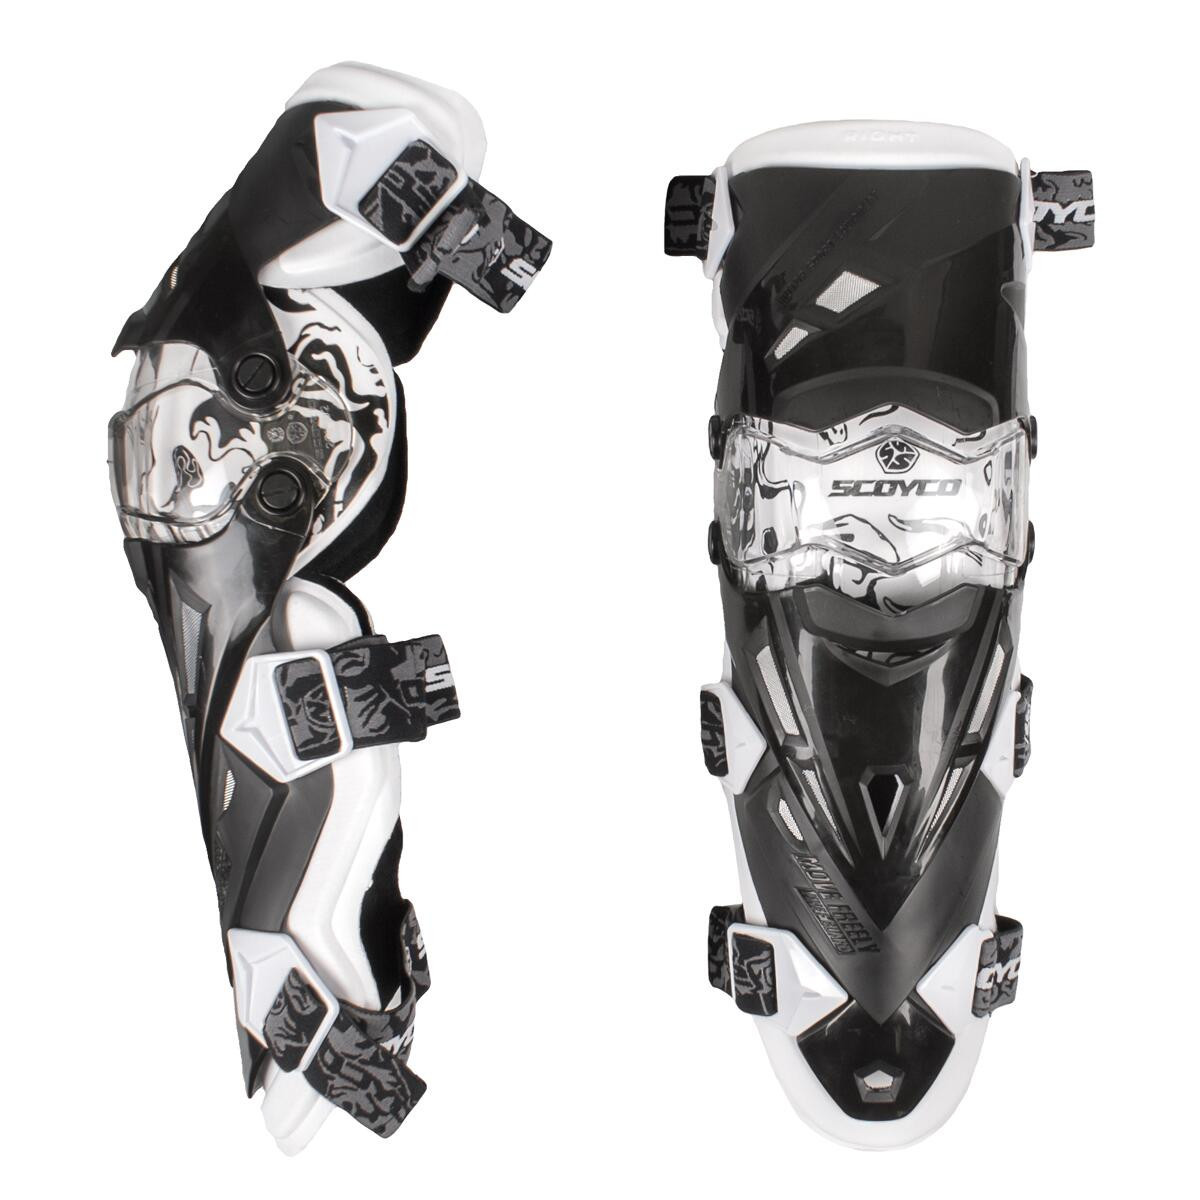 SCOYCO K12 black/white